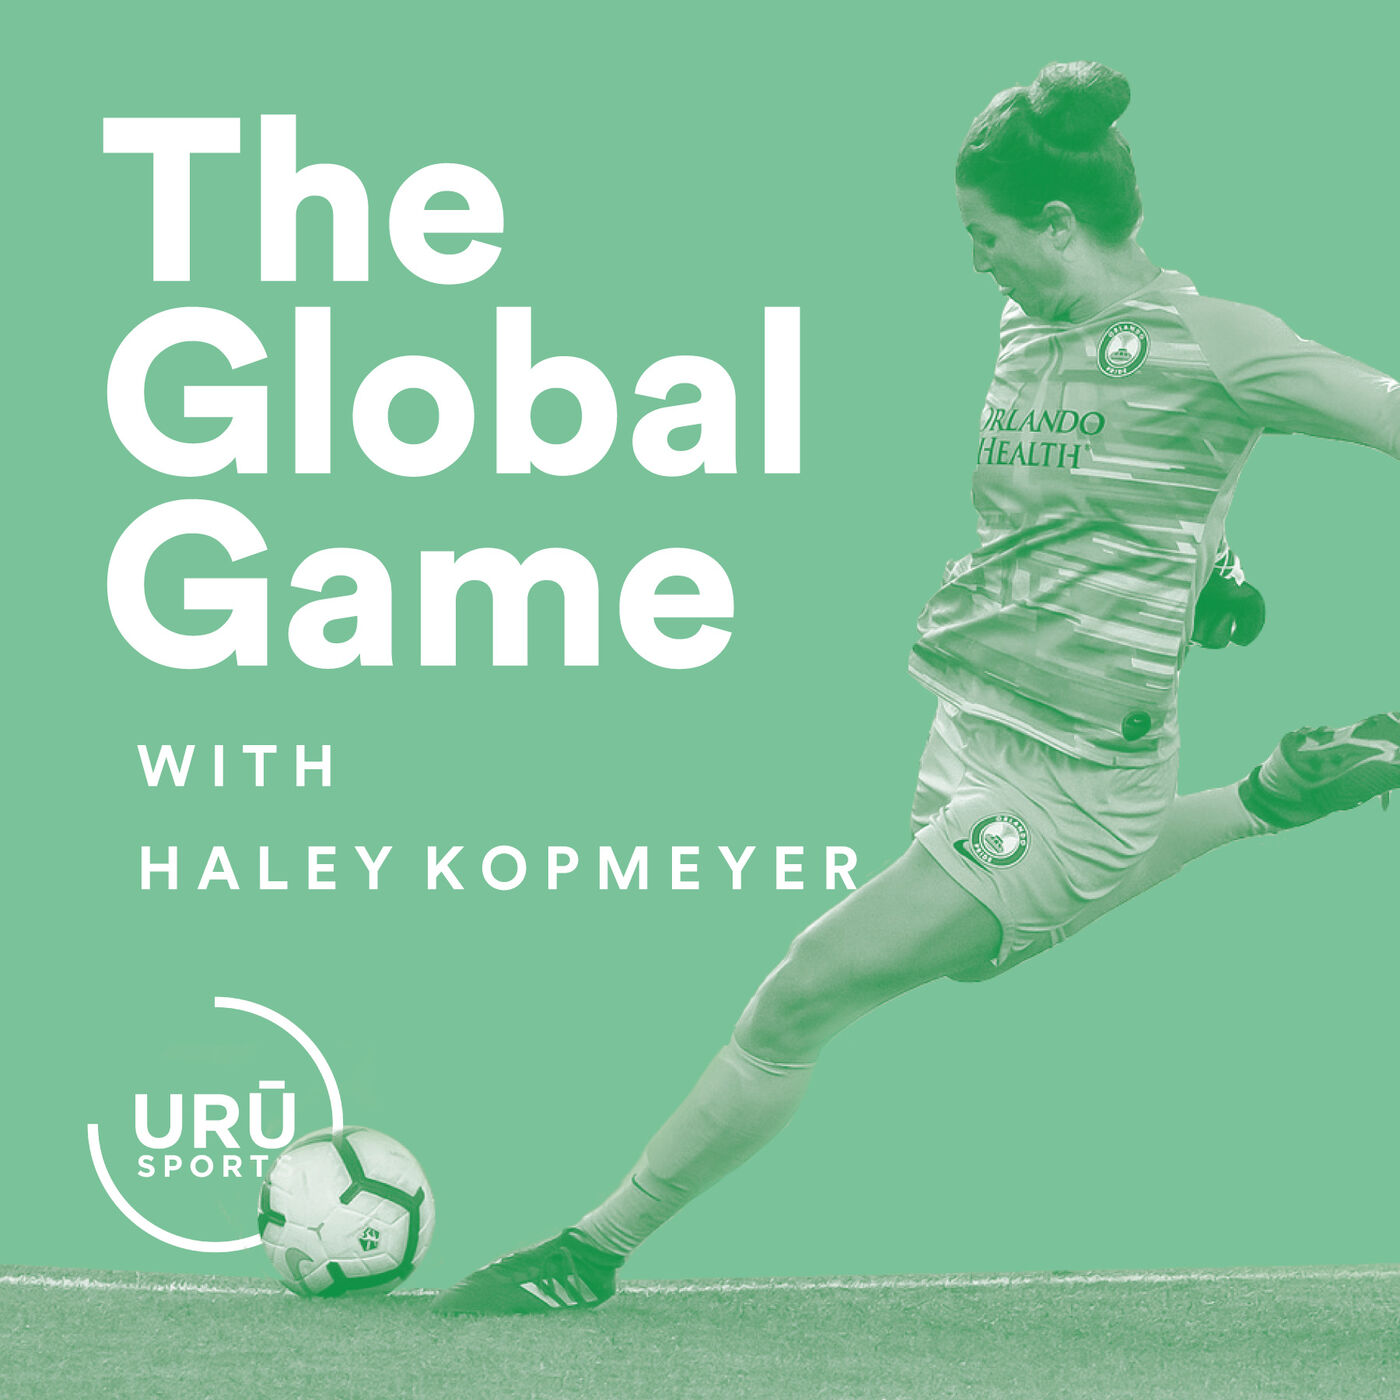 Haley Kopmeyer |  Drafted via Twitter